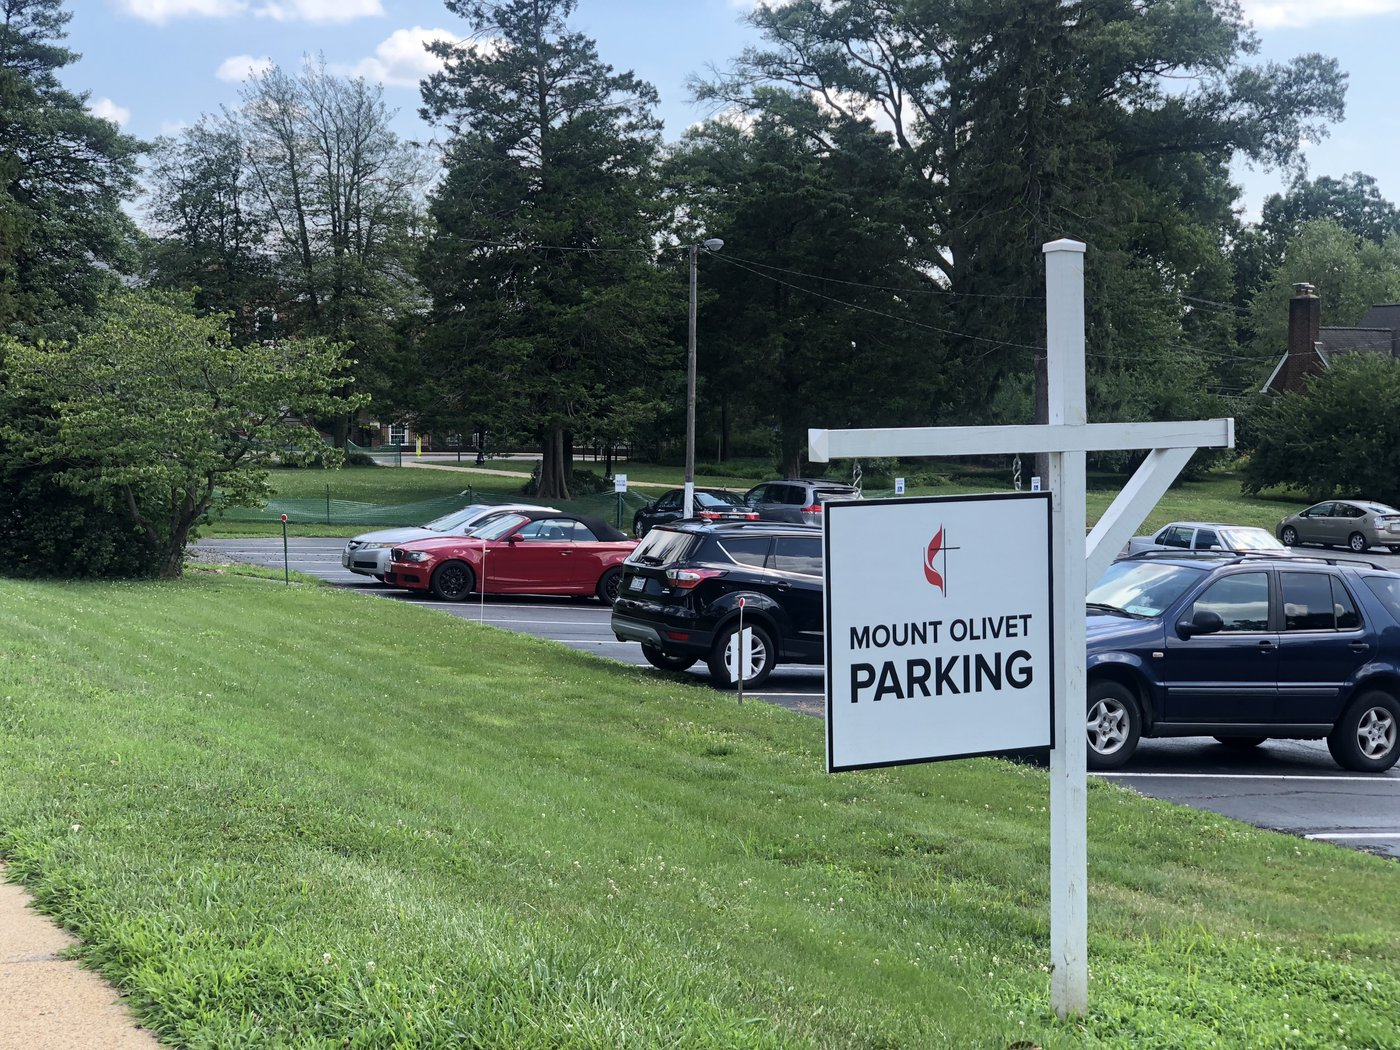 The parking lot signage on Glebe Road